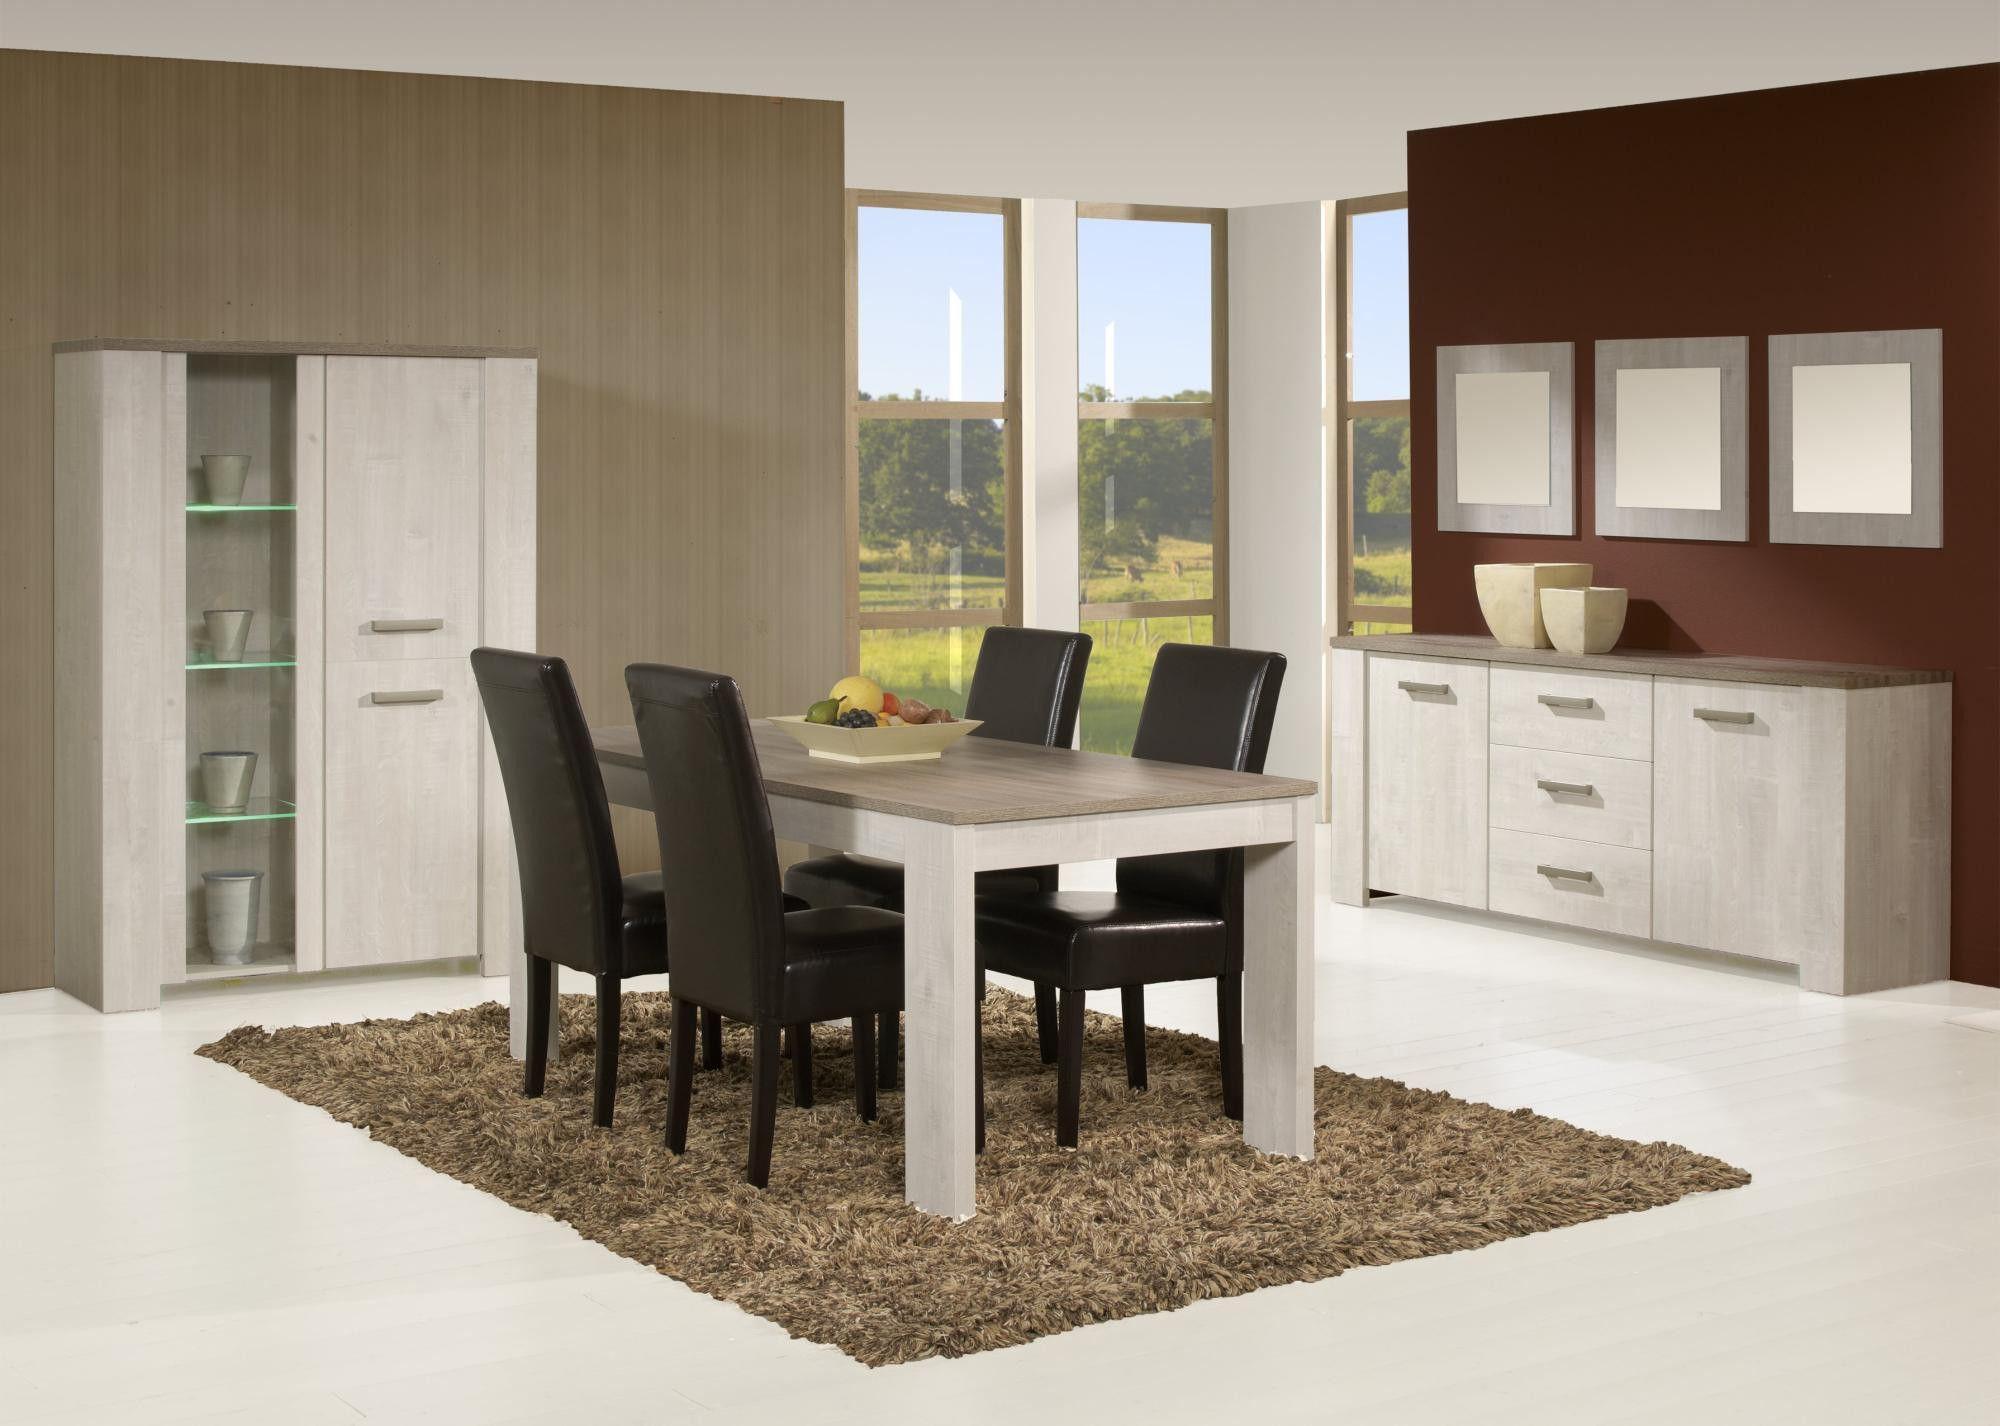 meuble contemporain salle a manger meubles appartement